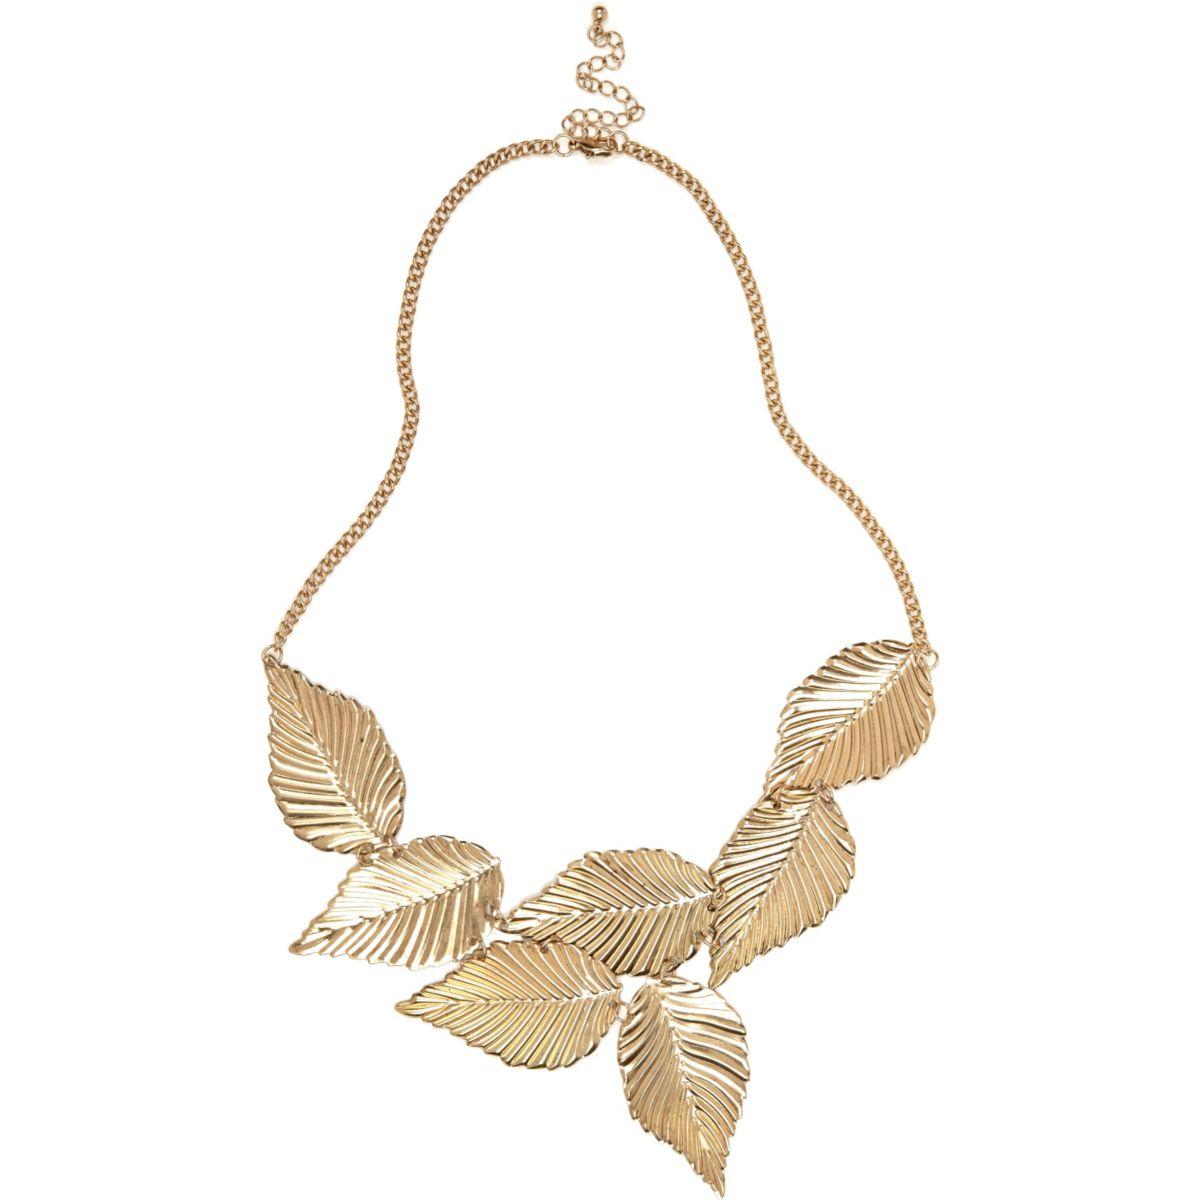 Gold tone leaf necklace